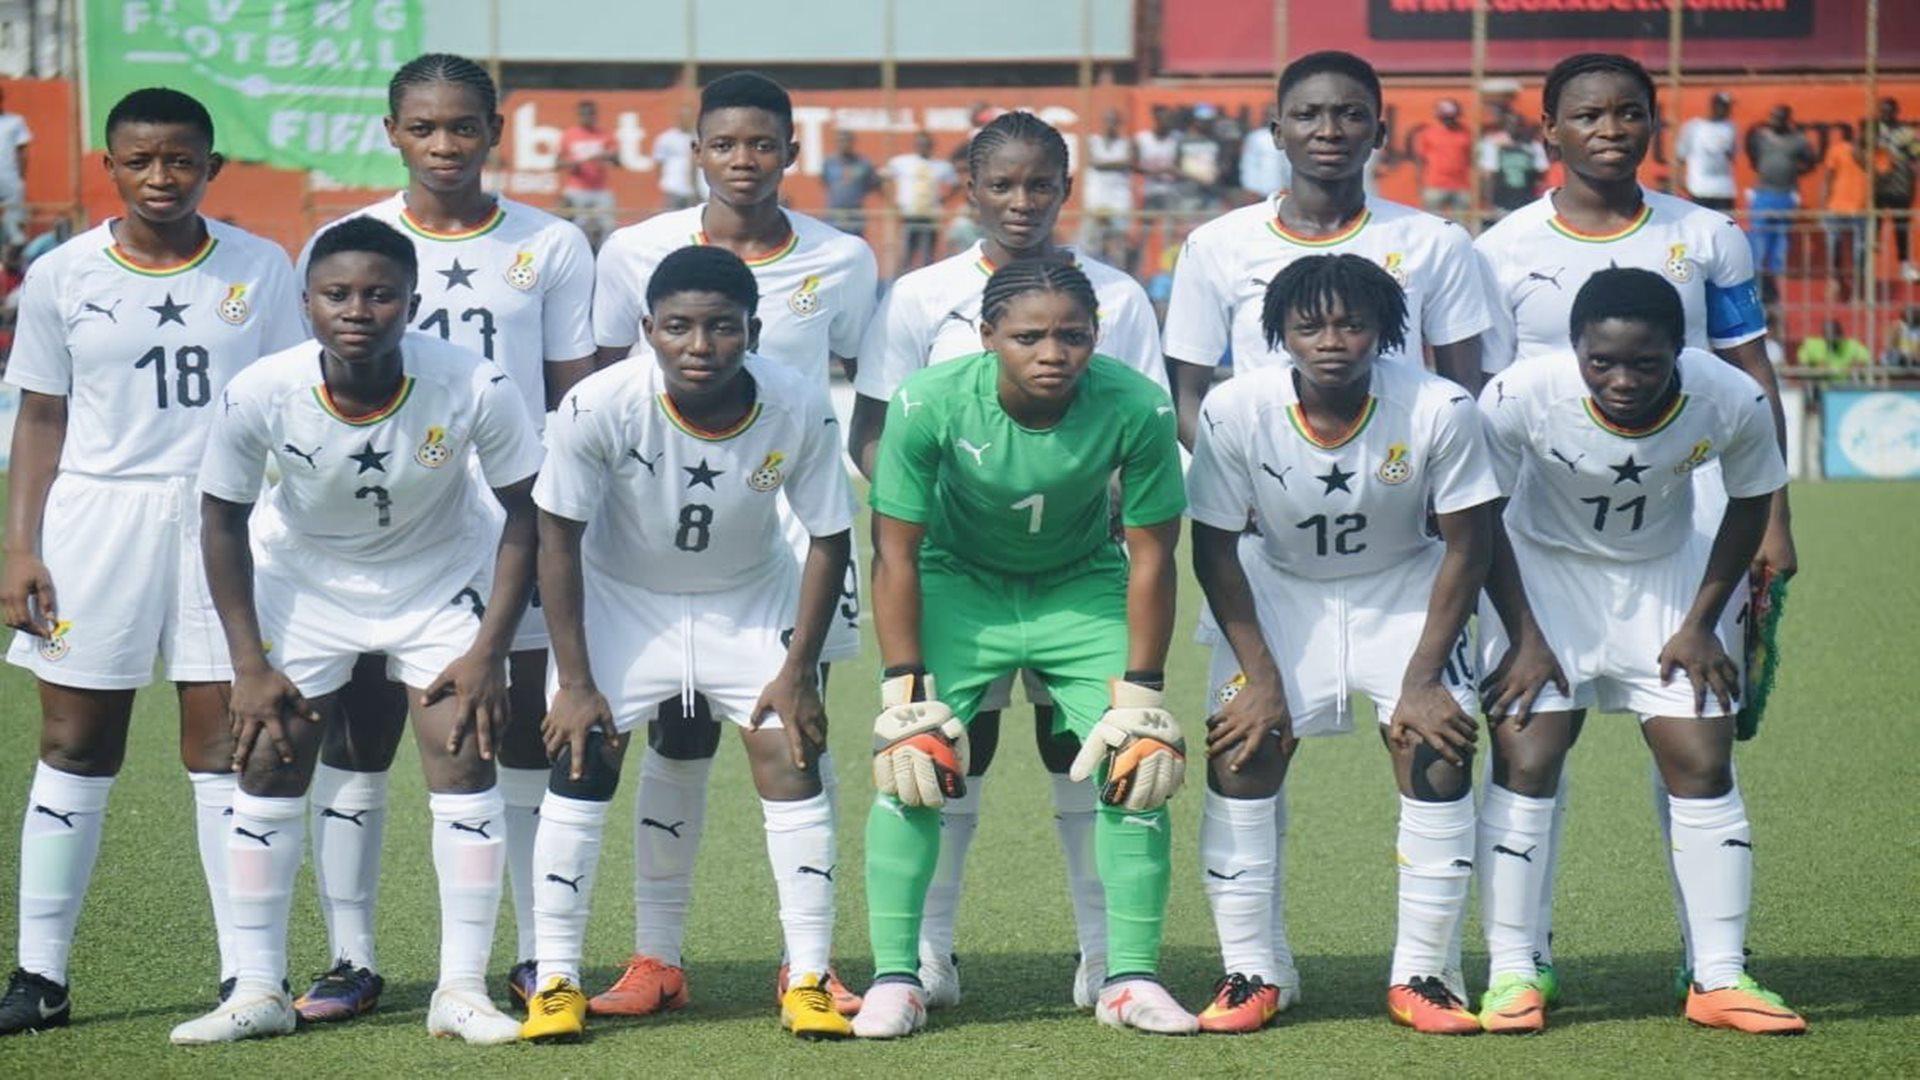 U17 WWCQ: Ghana calls up 30 players ahead of Nigeria showdown